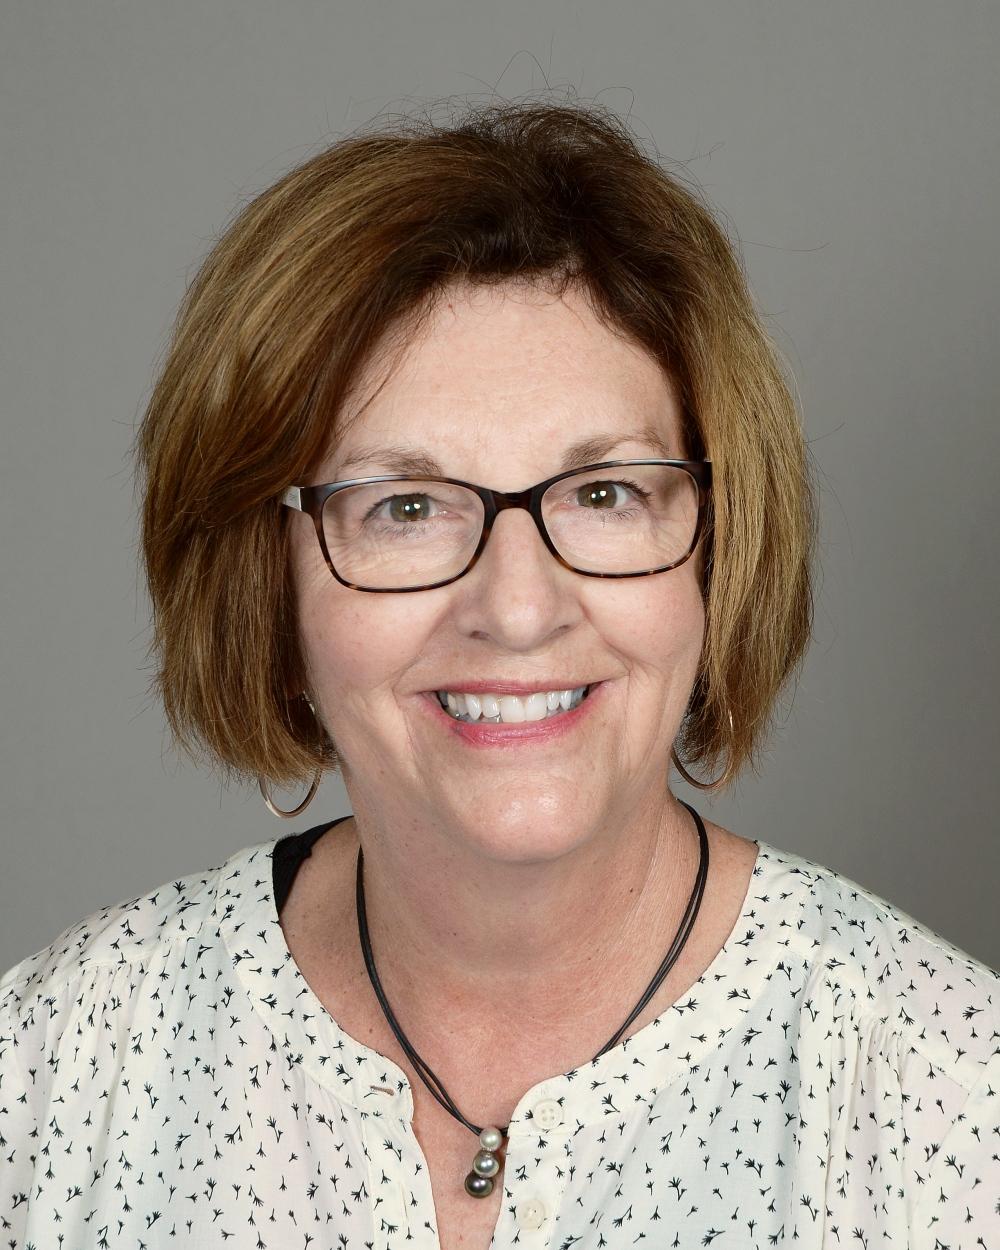 Ms. Marcia McGaughey Northwest Conference Trinity, Carthage